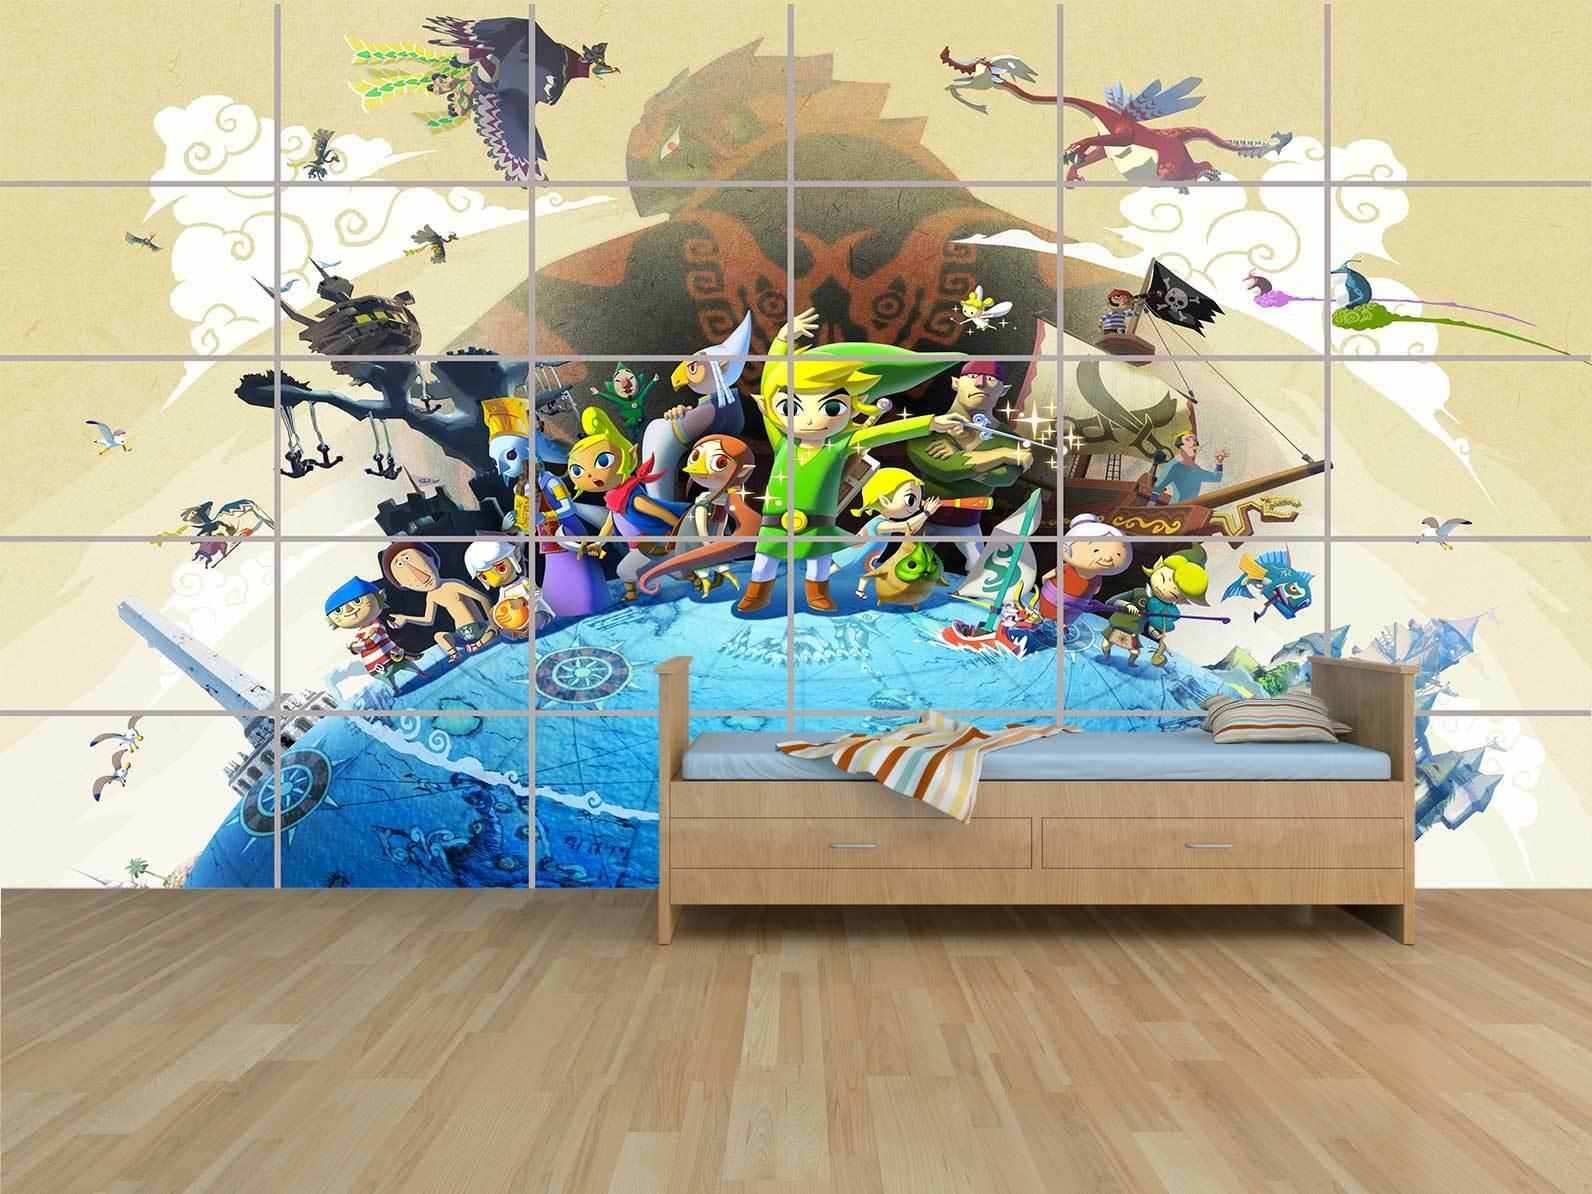 Link Zelda Wind Waker Giant Plakat Massif Riesig Raum Kinder -halle Spiele